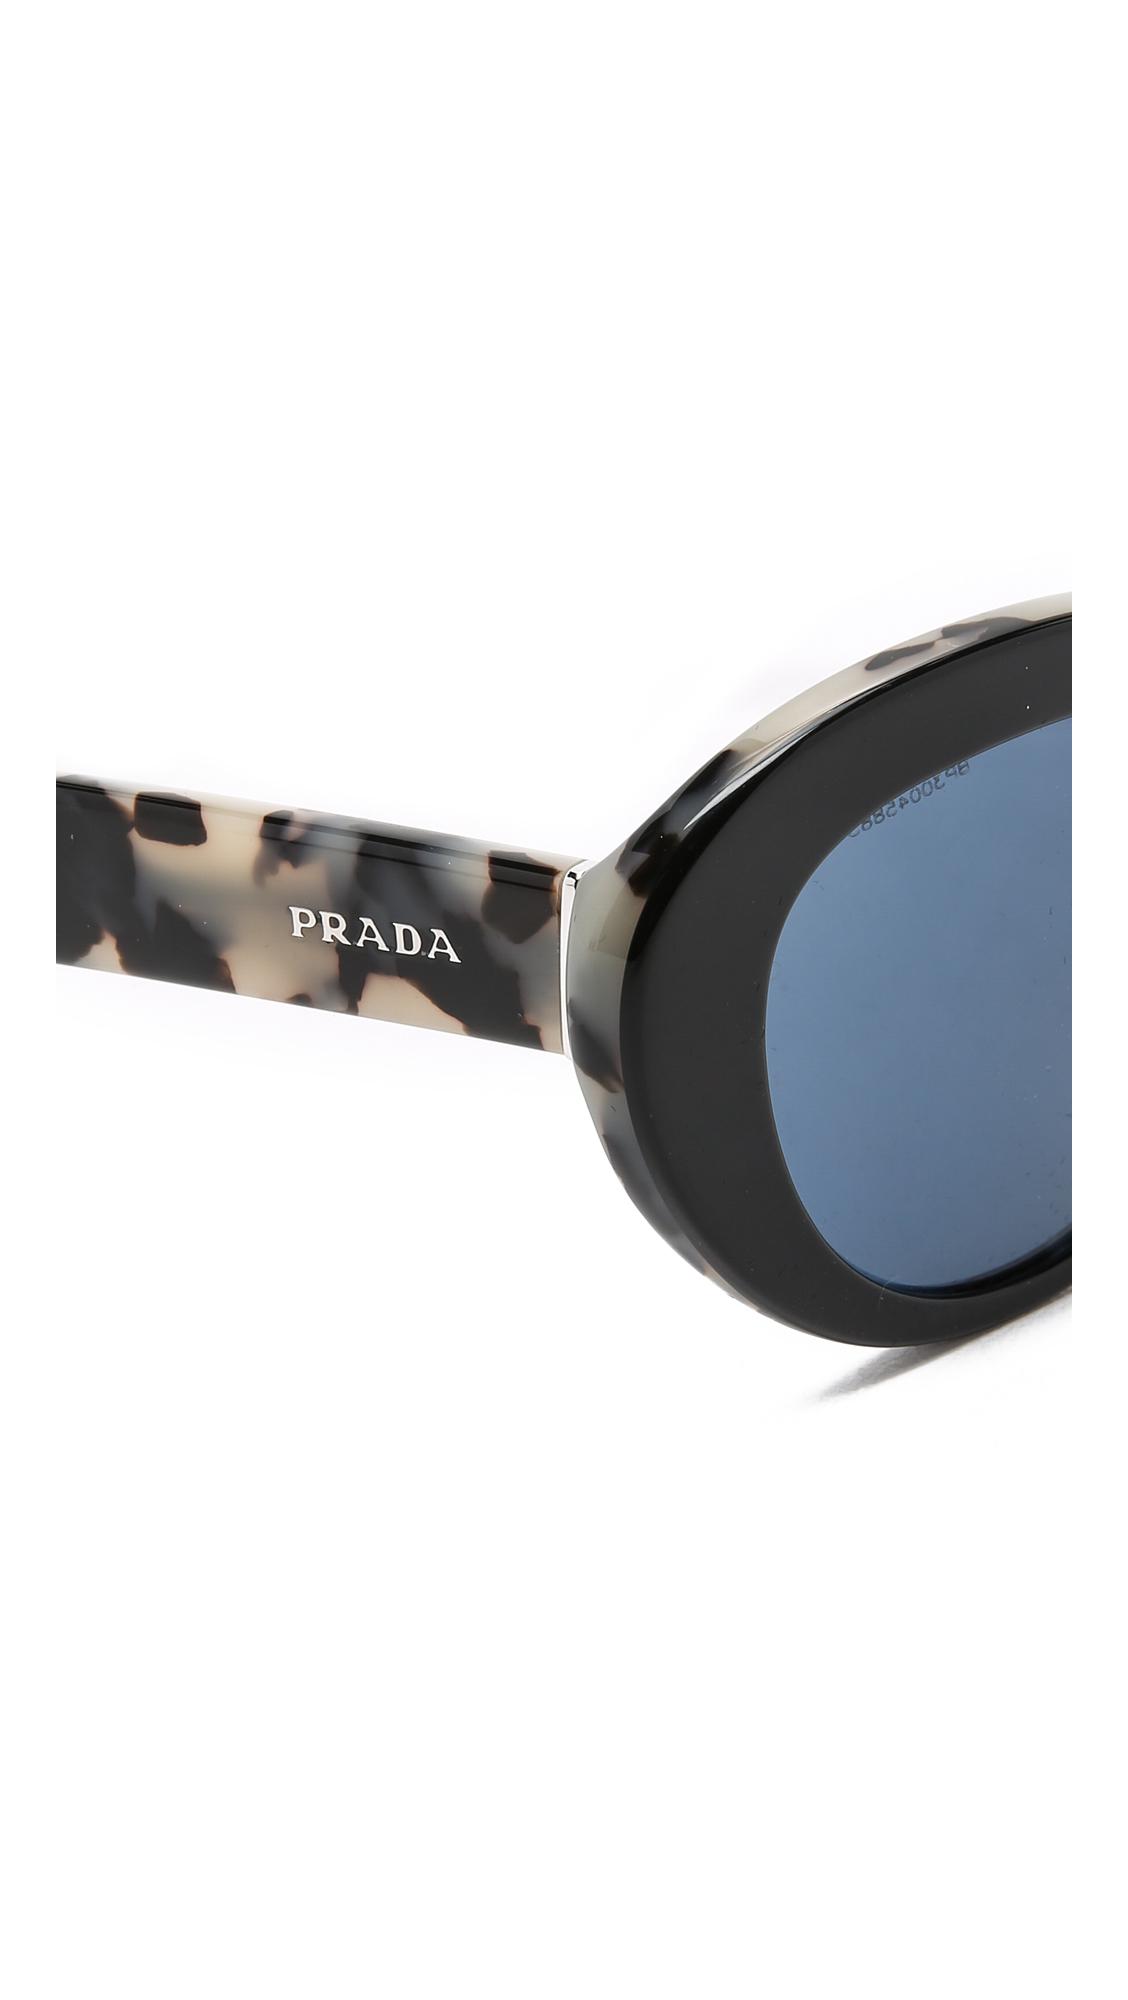 prada begs - Prada Oval Cat Sunglasses in Black (Black/White Havana/Blue) | Lyst